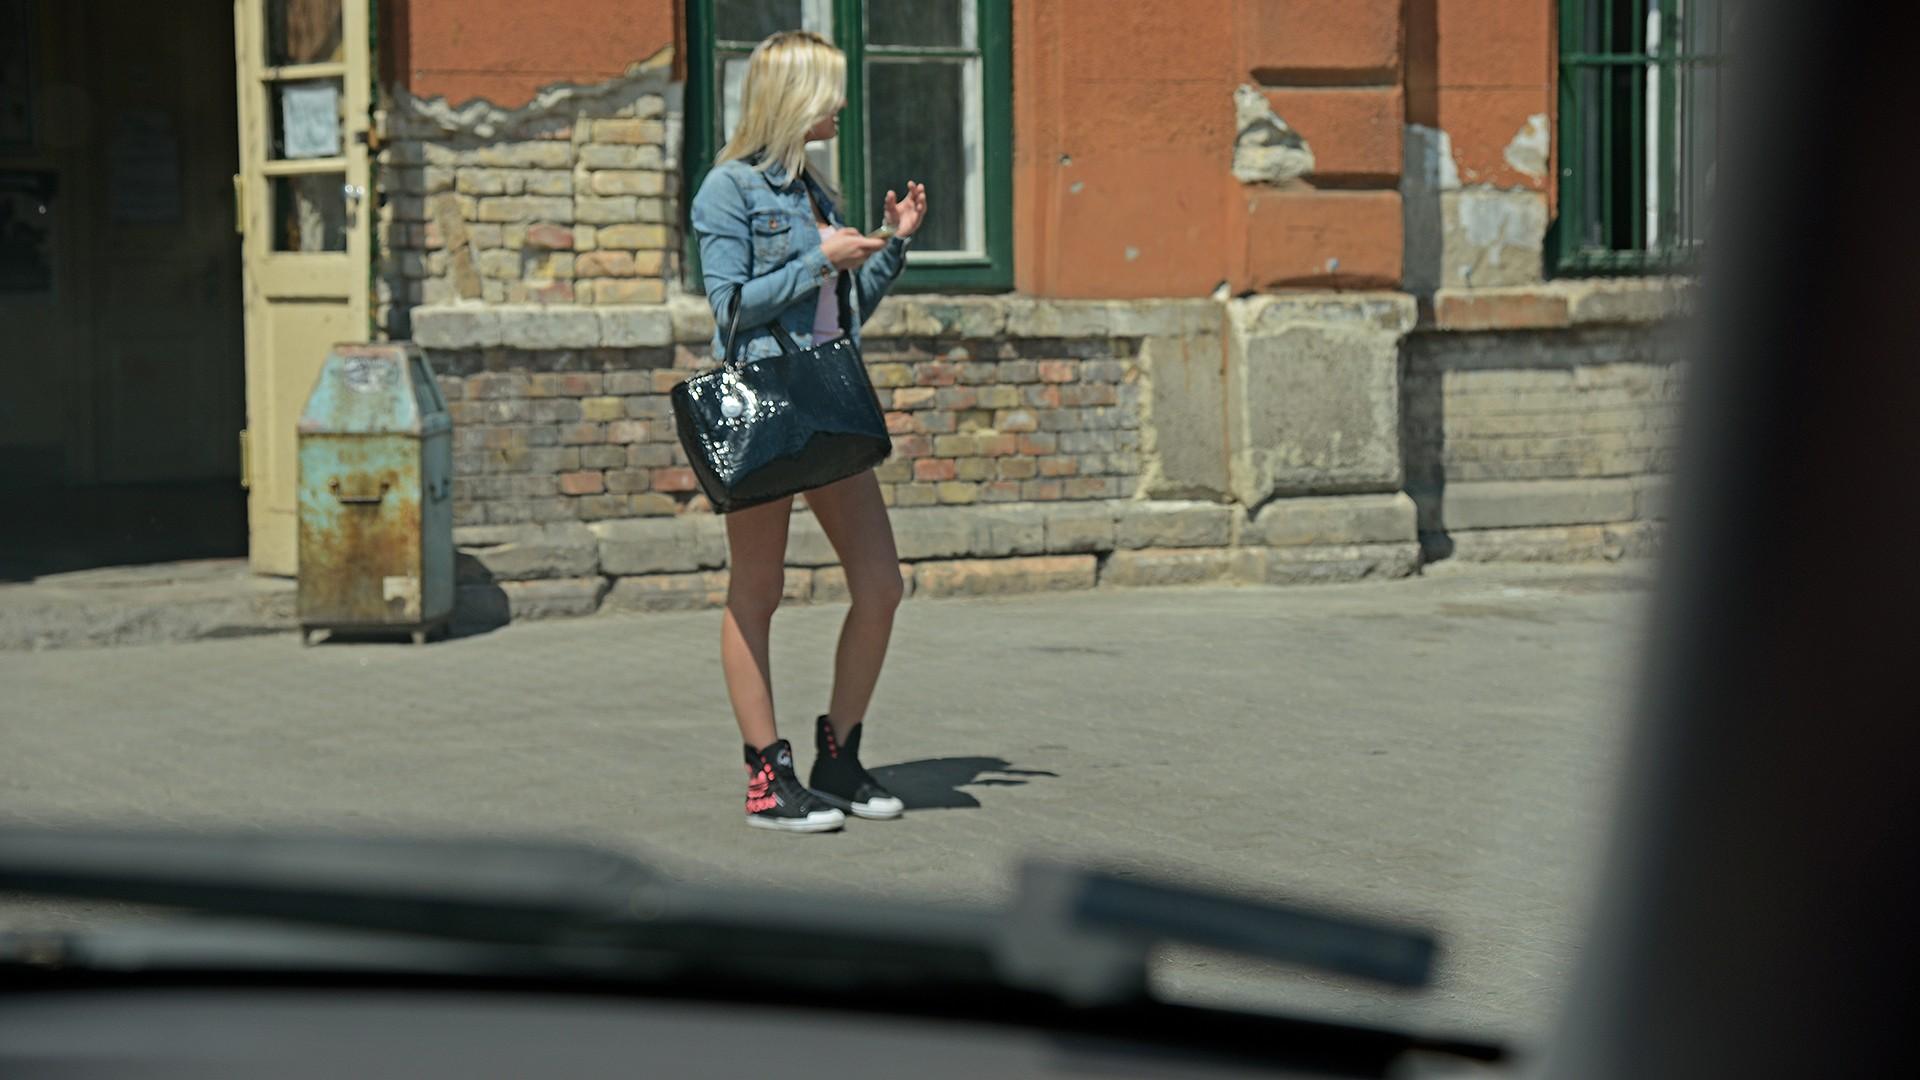 Czech Skank Seduction - Stranded Teens